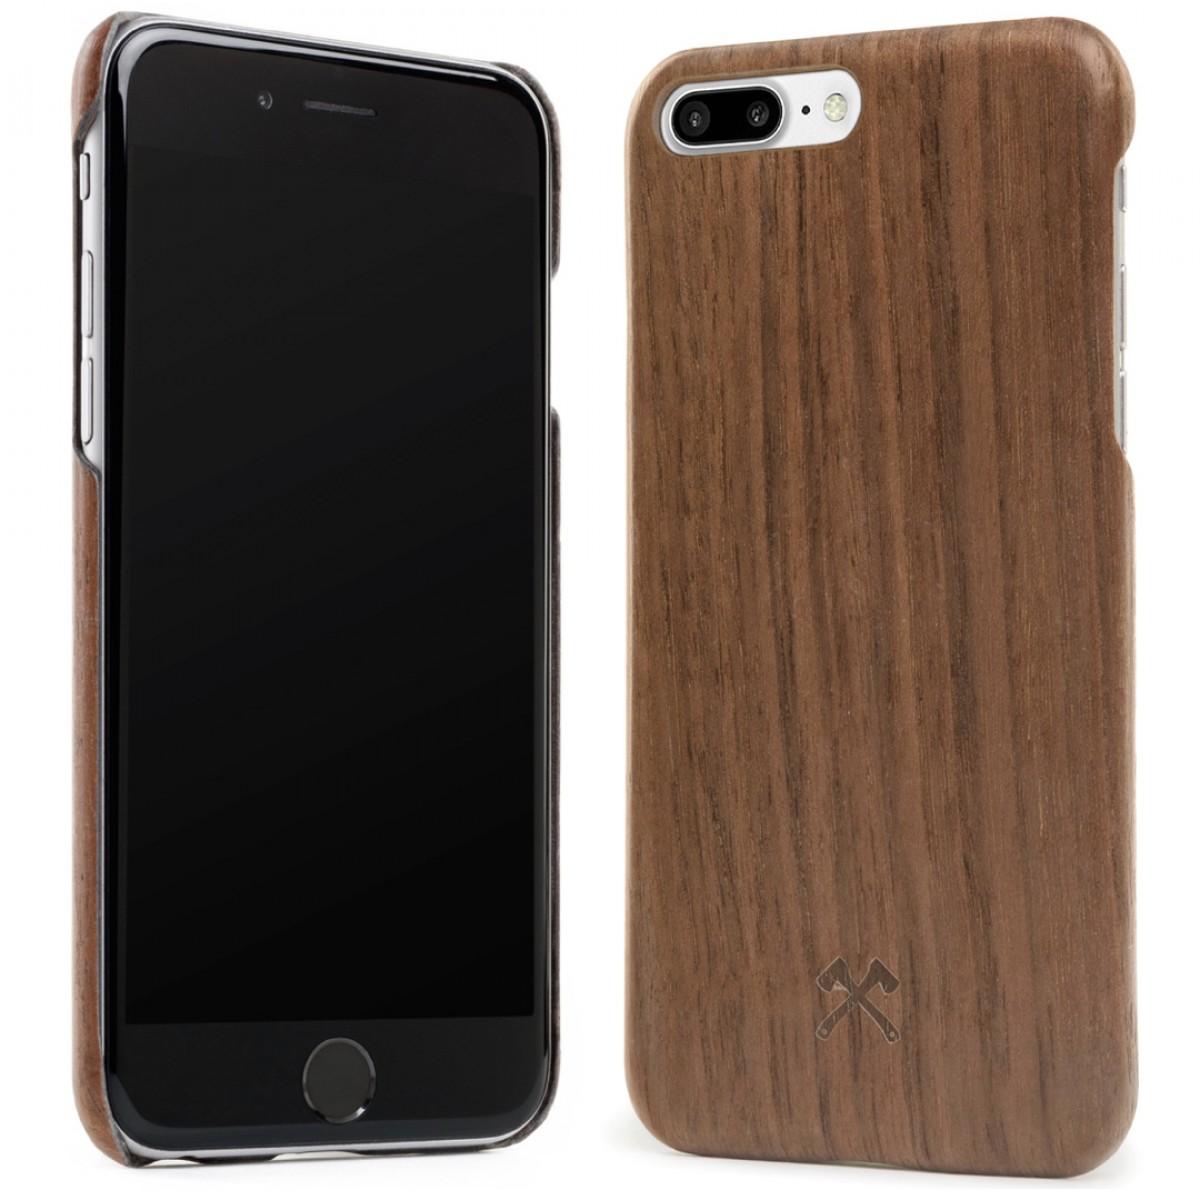 Woodcessories - EcoCase Cevlar - Premium Design Hülle, Case, Cover, Backcover für das iPhone aus FSC zert. Holz (Walnuss, Kirsche, Bambus)